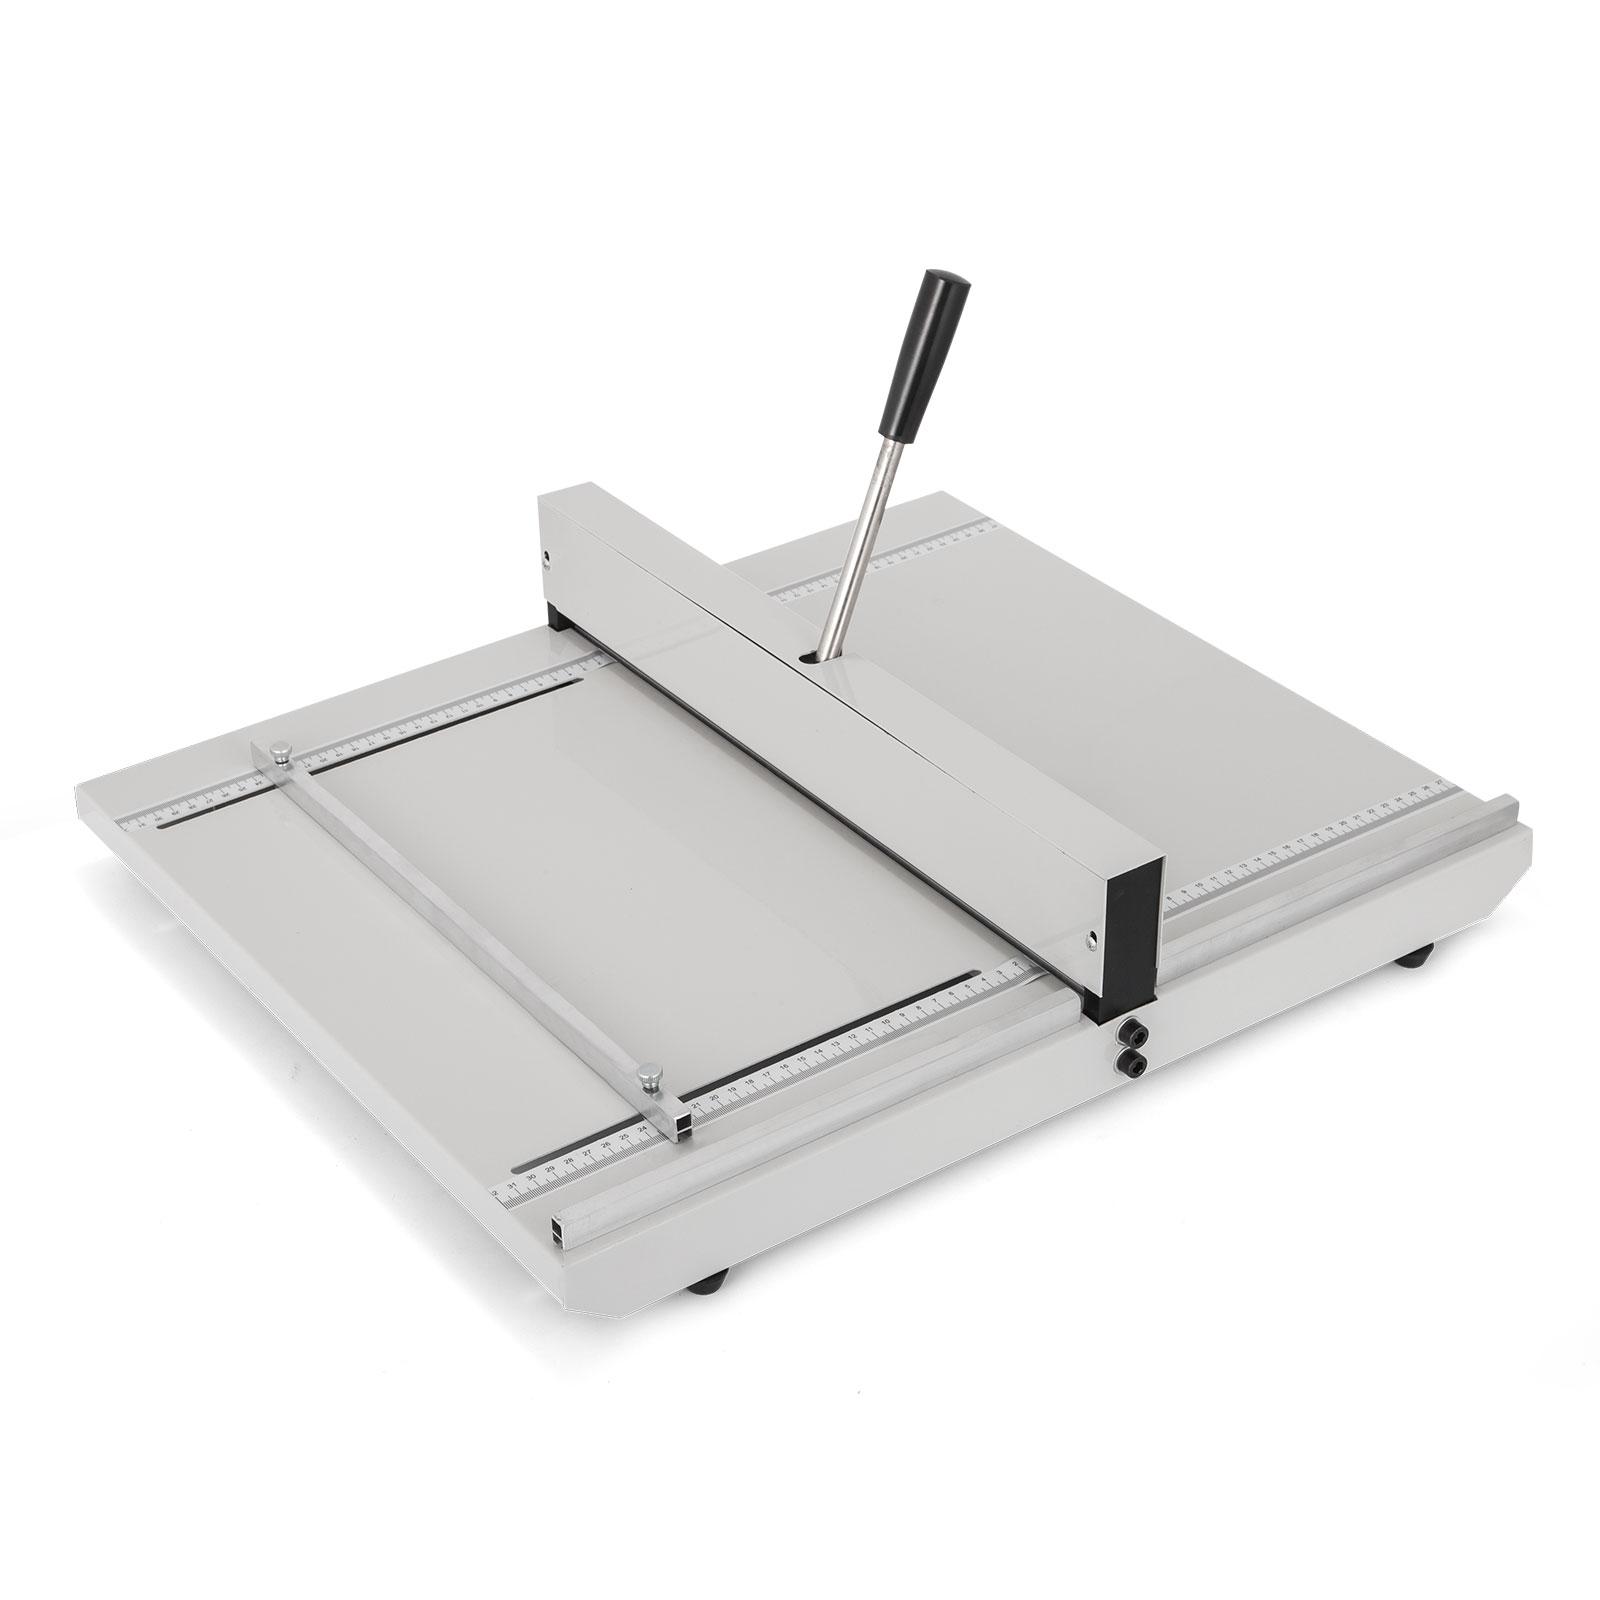 Cordonatrice-Perforatrice-Max-350-520mm-Profondita-Regolabile-Elettrica-Manuale miniatura 51